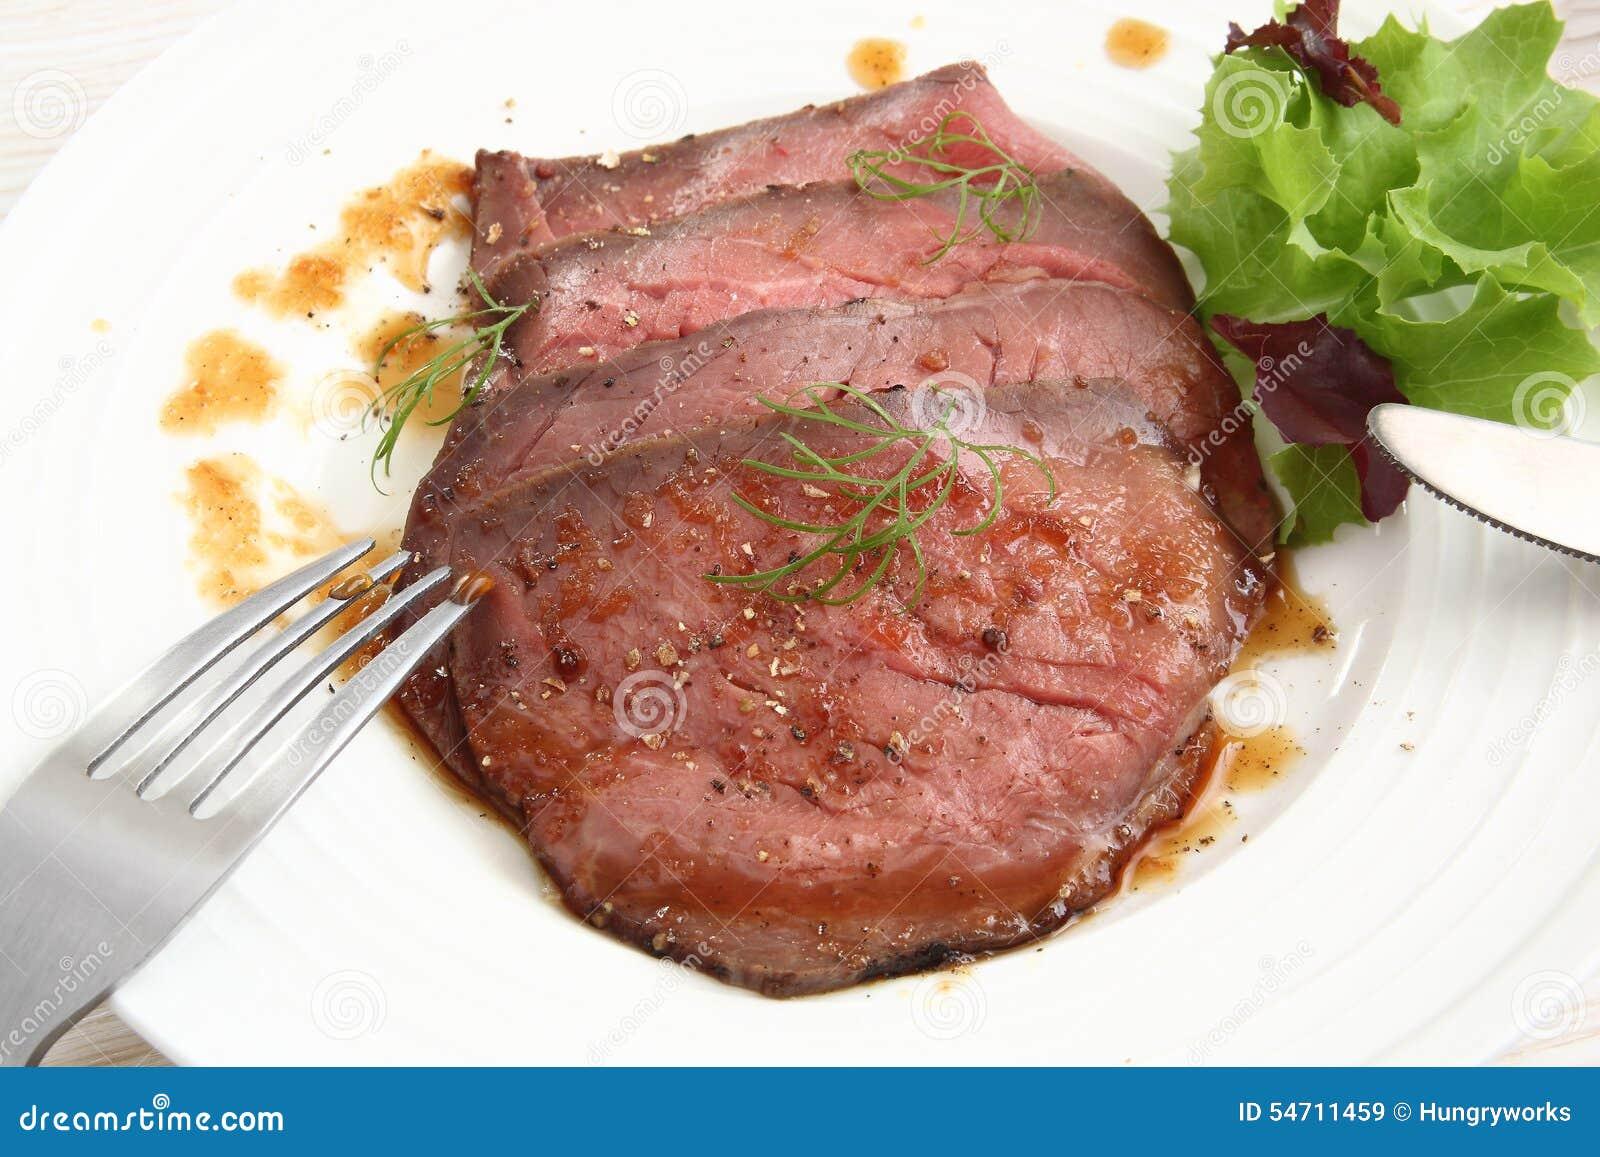 how to make gravy roast beef